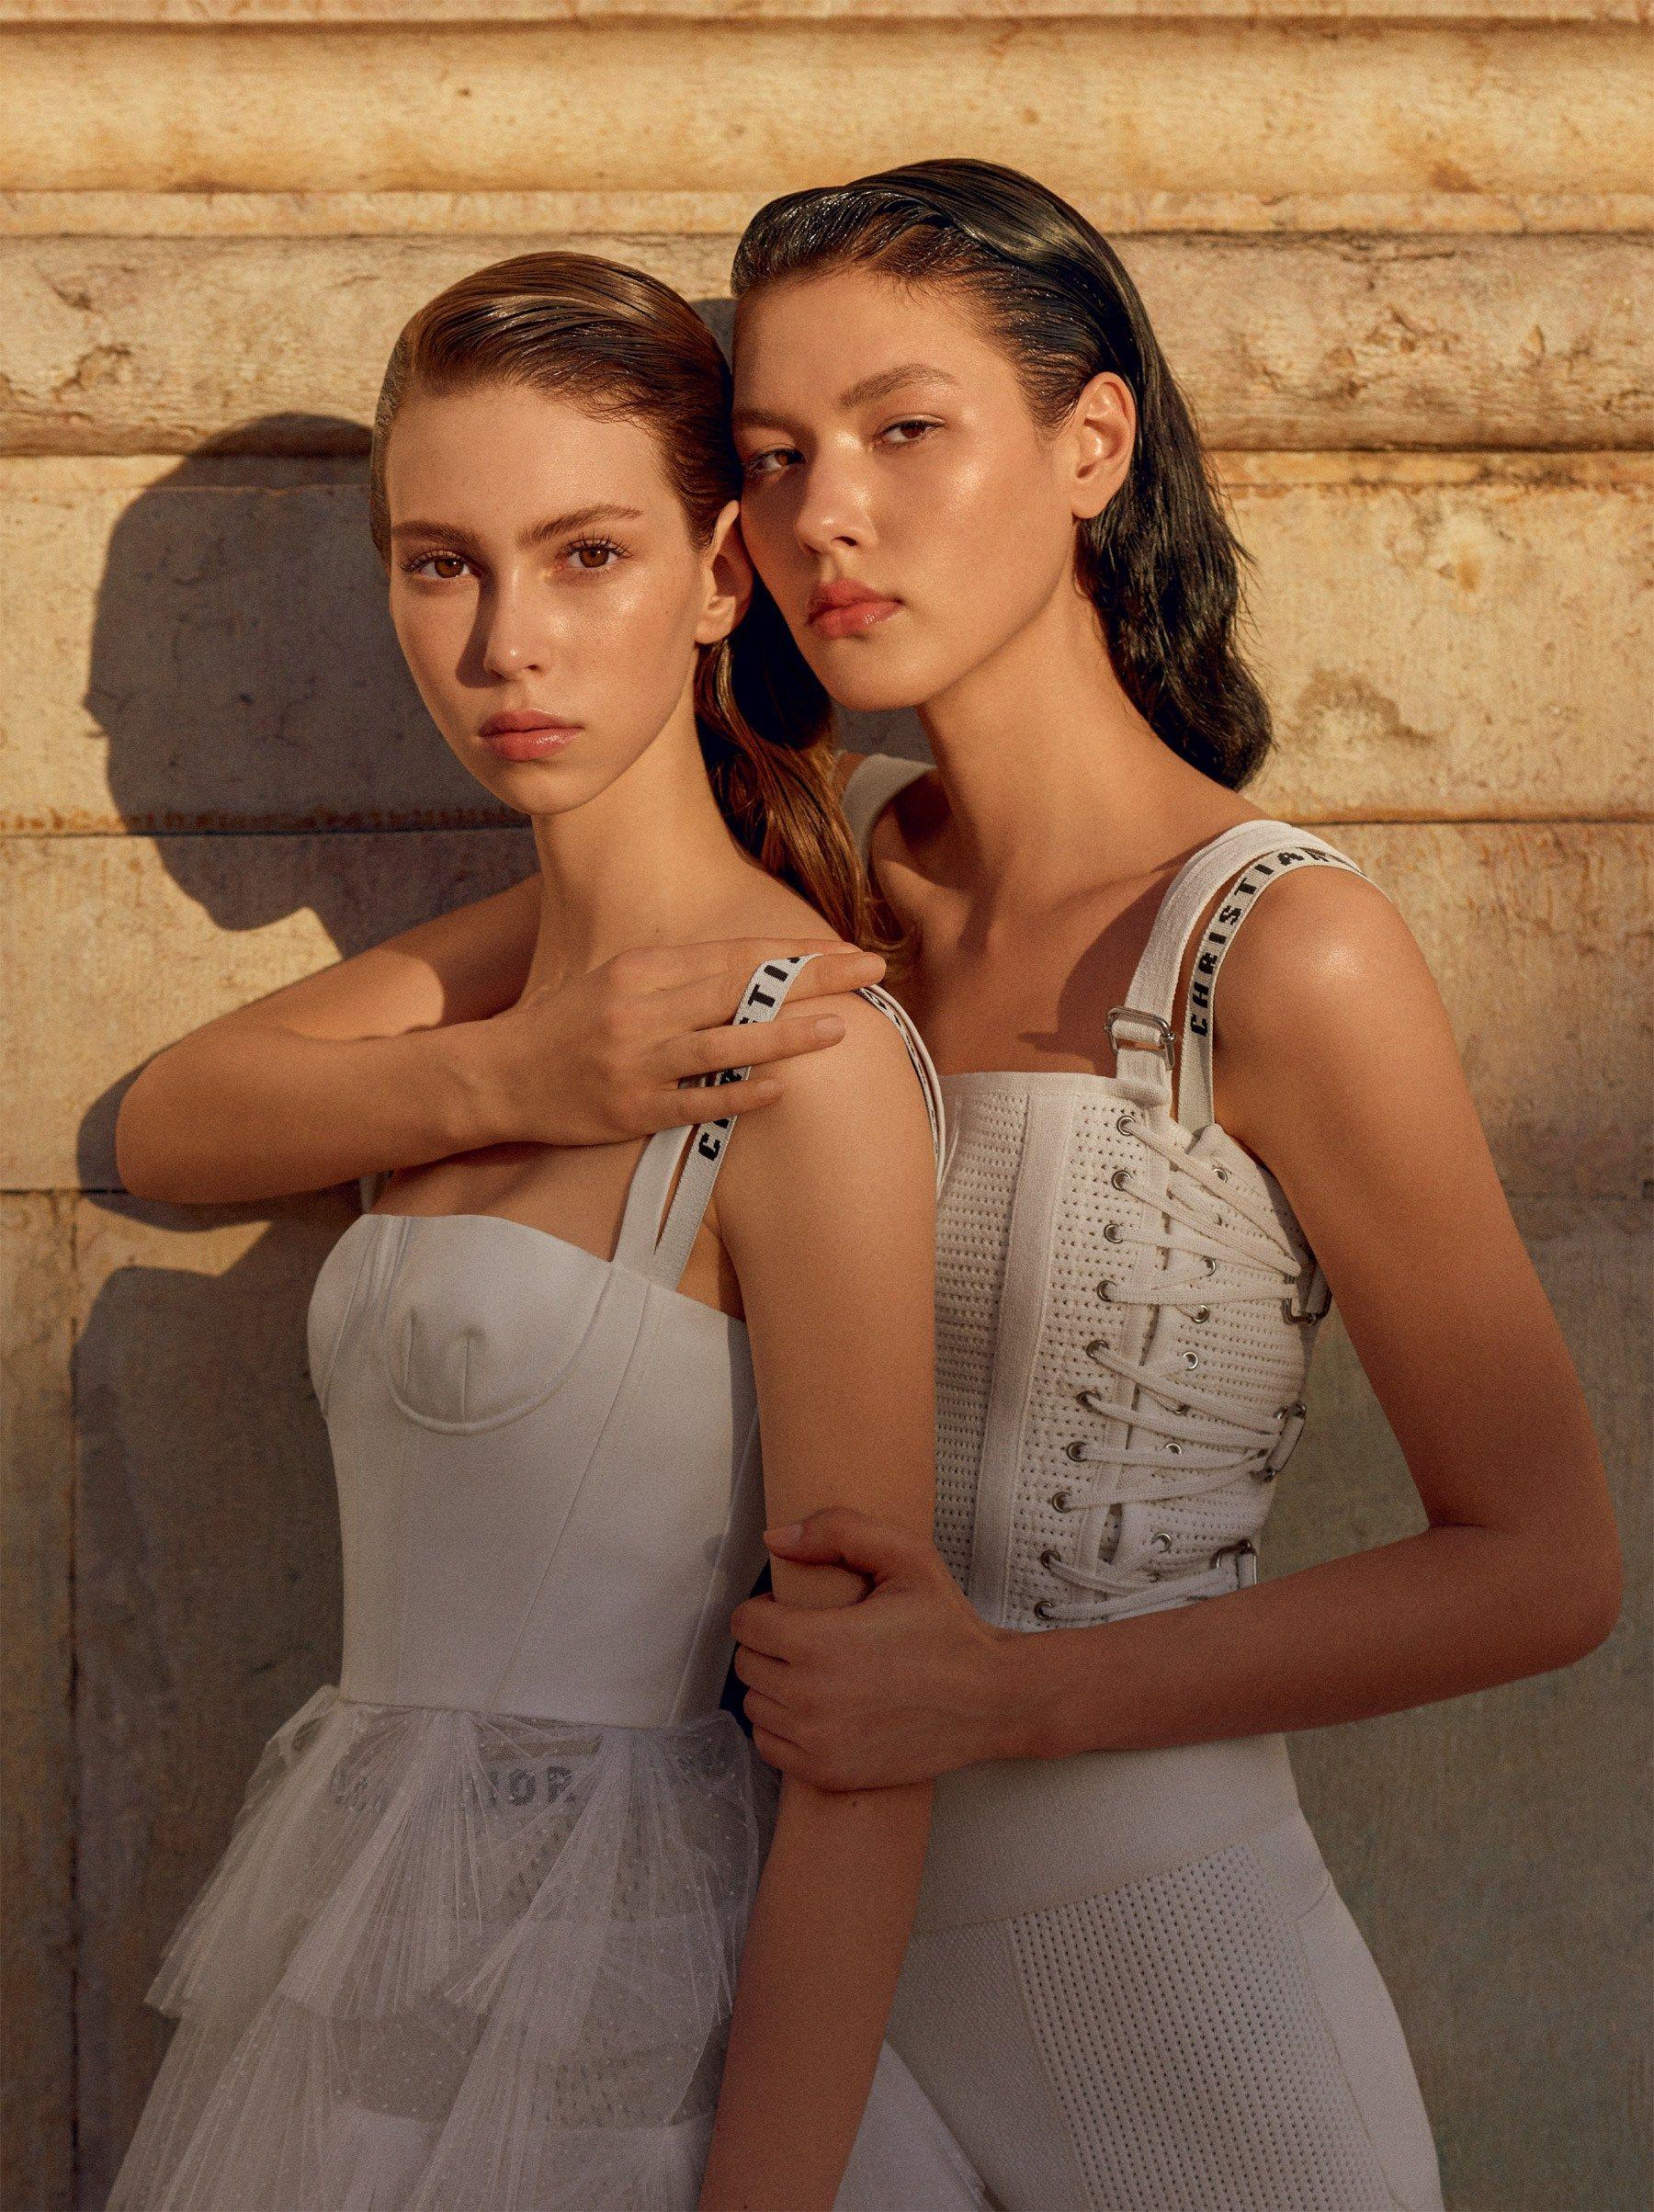 Vogue-Brasil-March-2017-Angelica-Erthal-Lorena-Maraschi-by-Zee-Nunes-Cover-2-Dior.jpg (1800×2407)